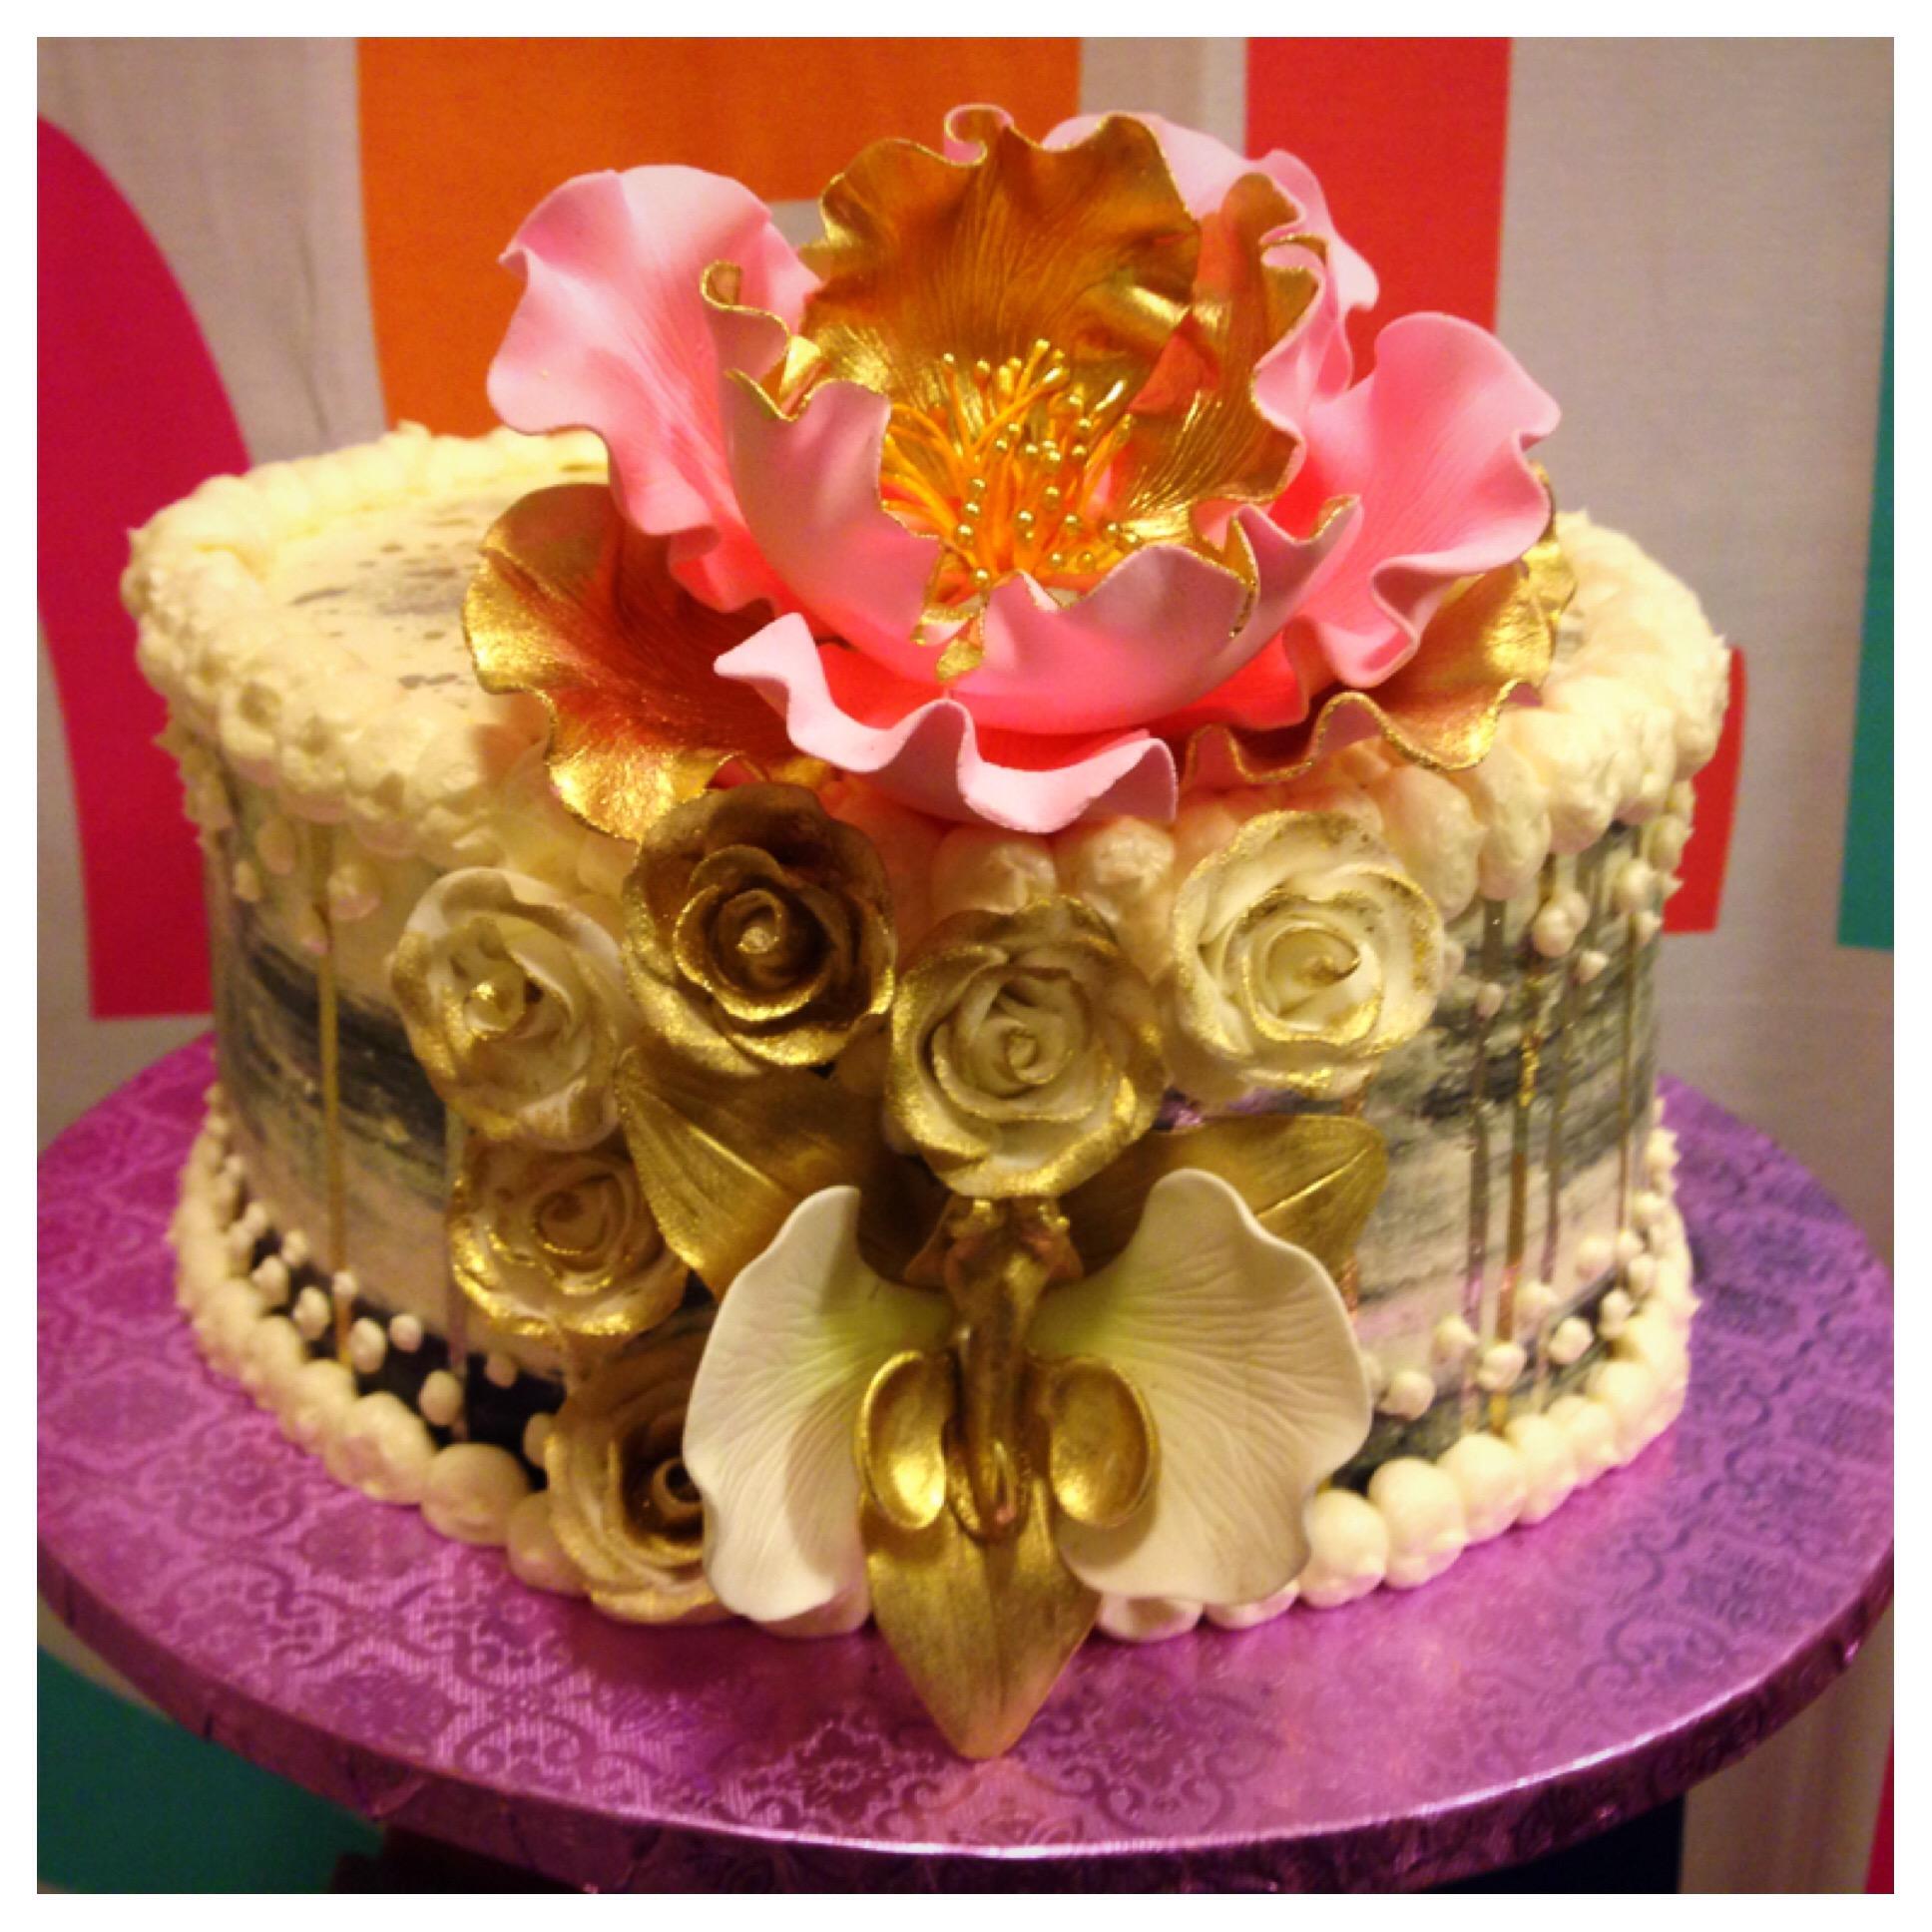 Flower Drama! 9inch birthday cake $195